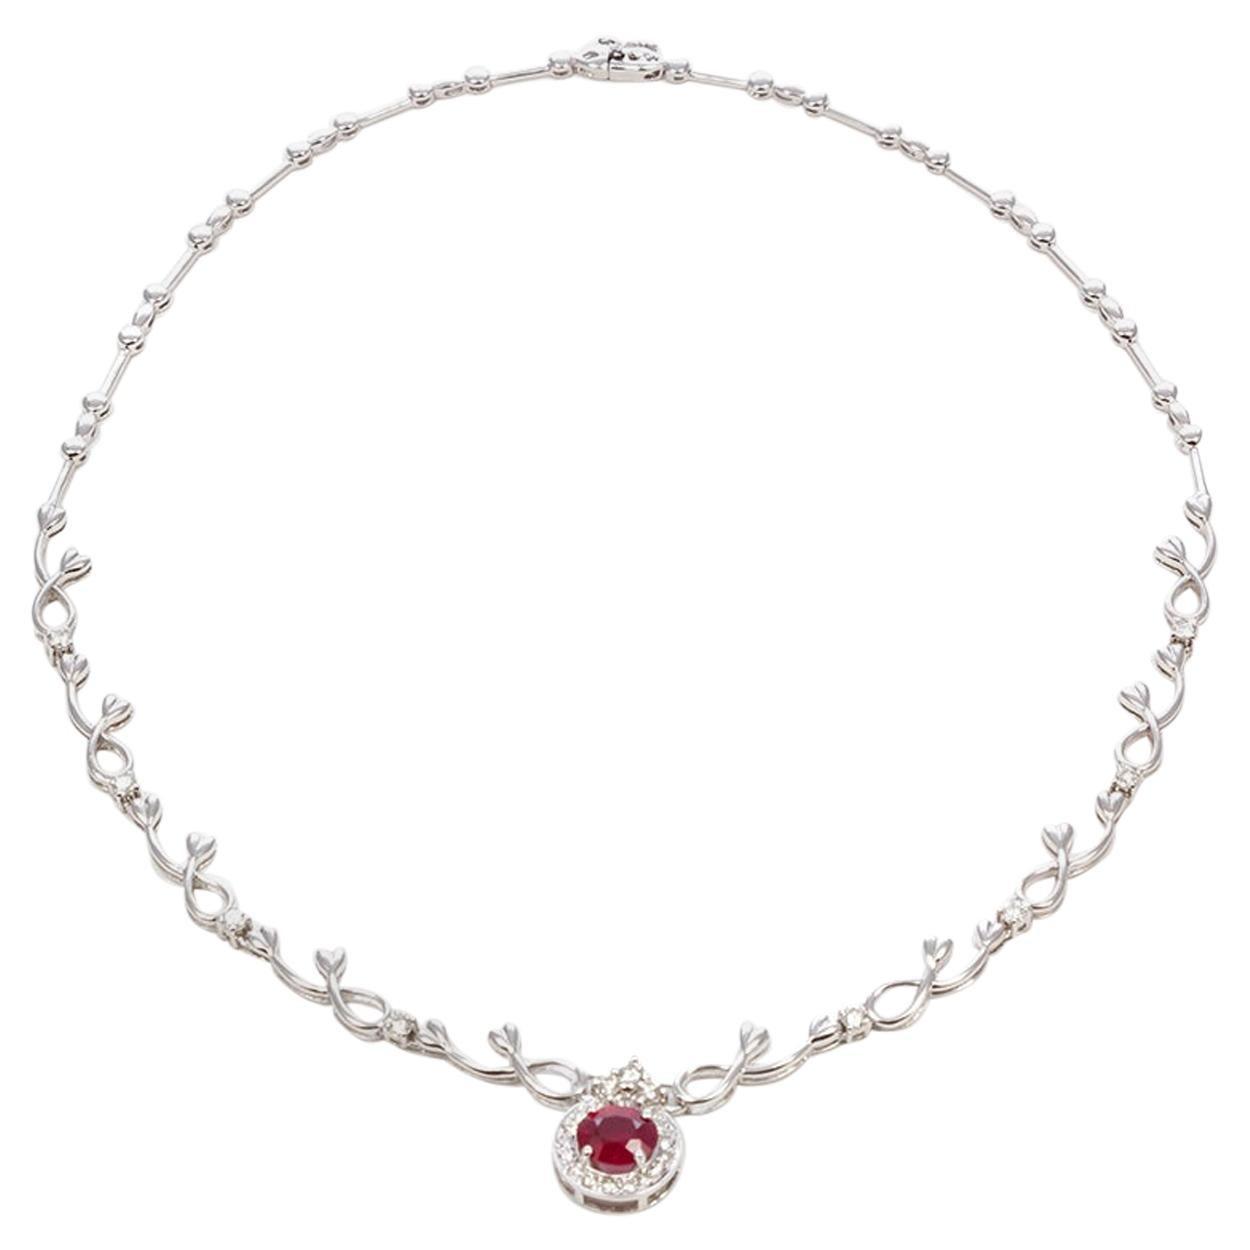 18 Karat White Gold Diamond and Ruby Necklace